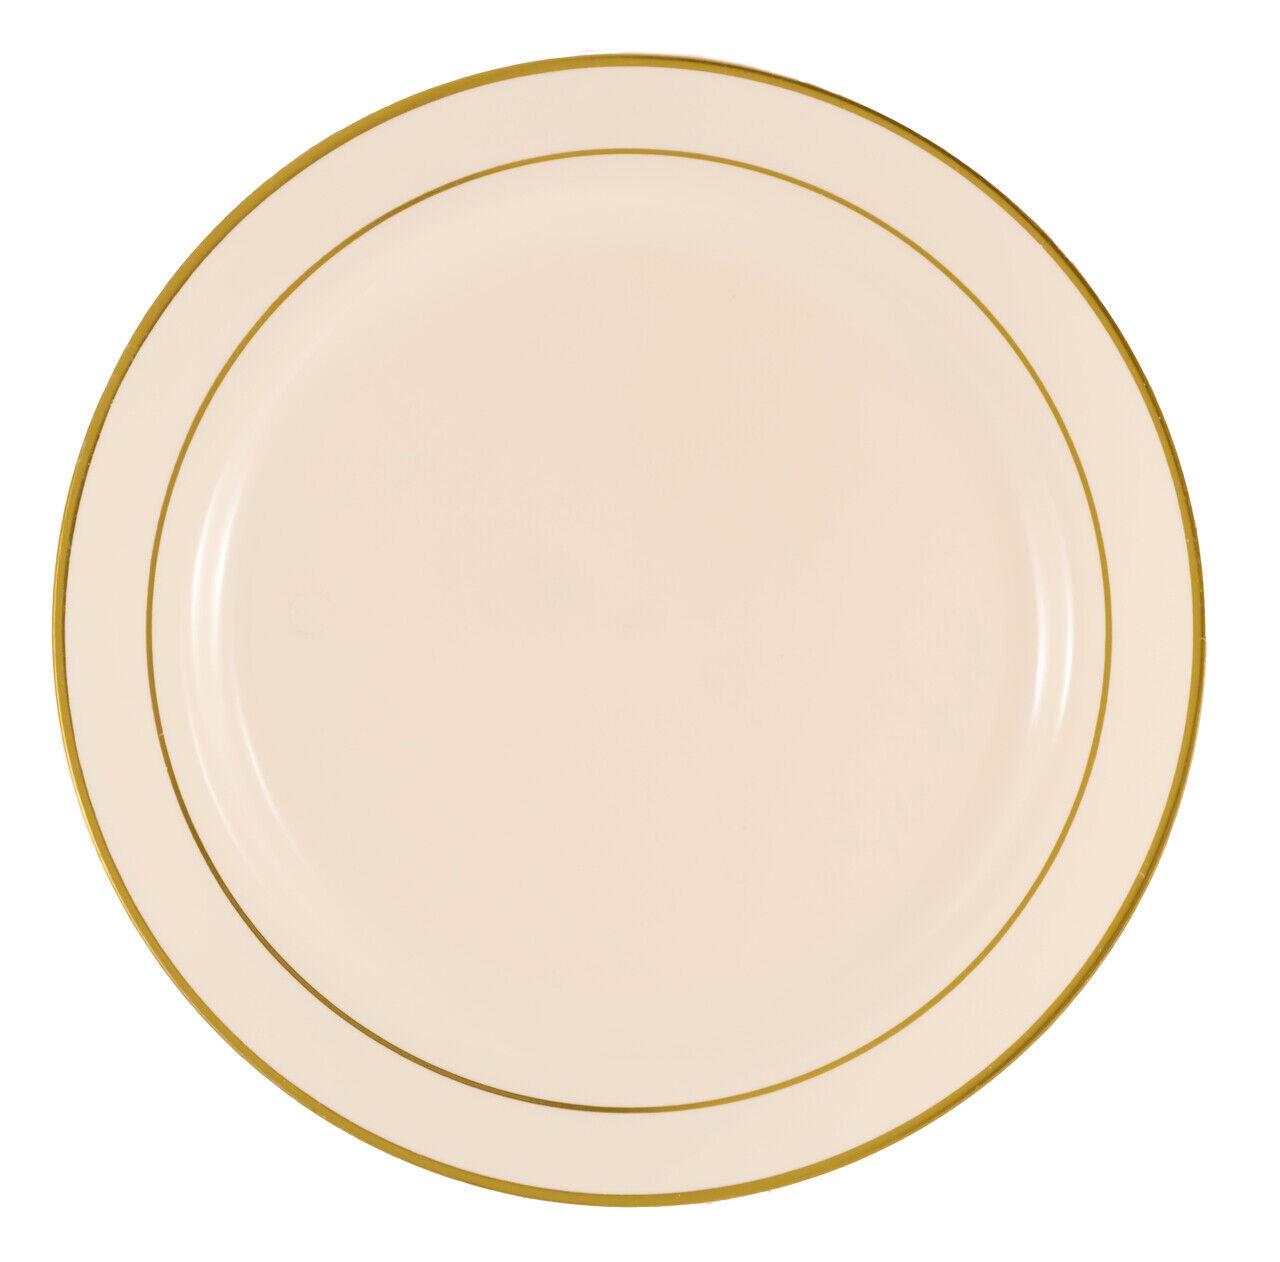 120 Pieces 9  Elegant Rimmed Plastic Round Lunch-Buffet Wedding Plates